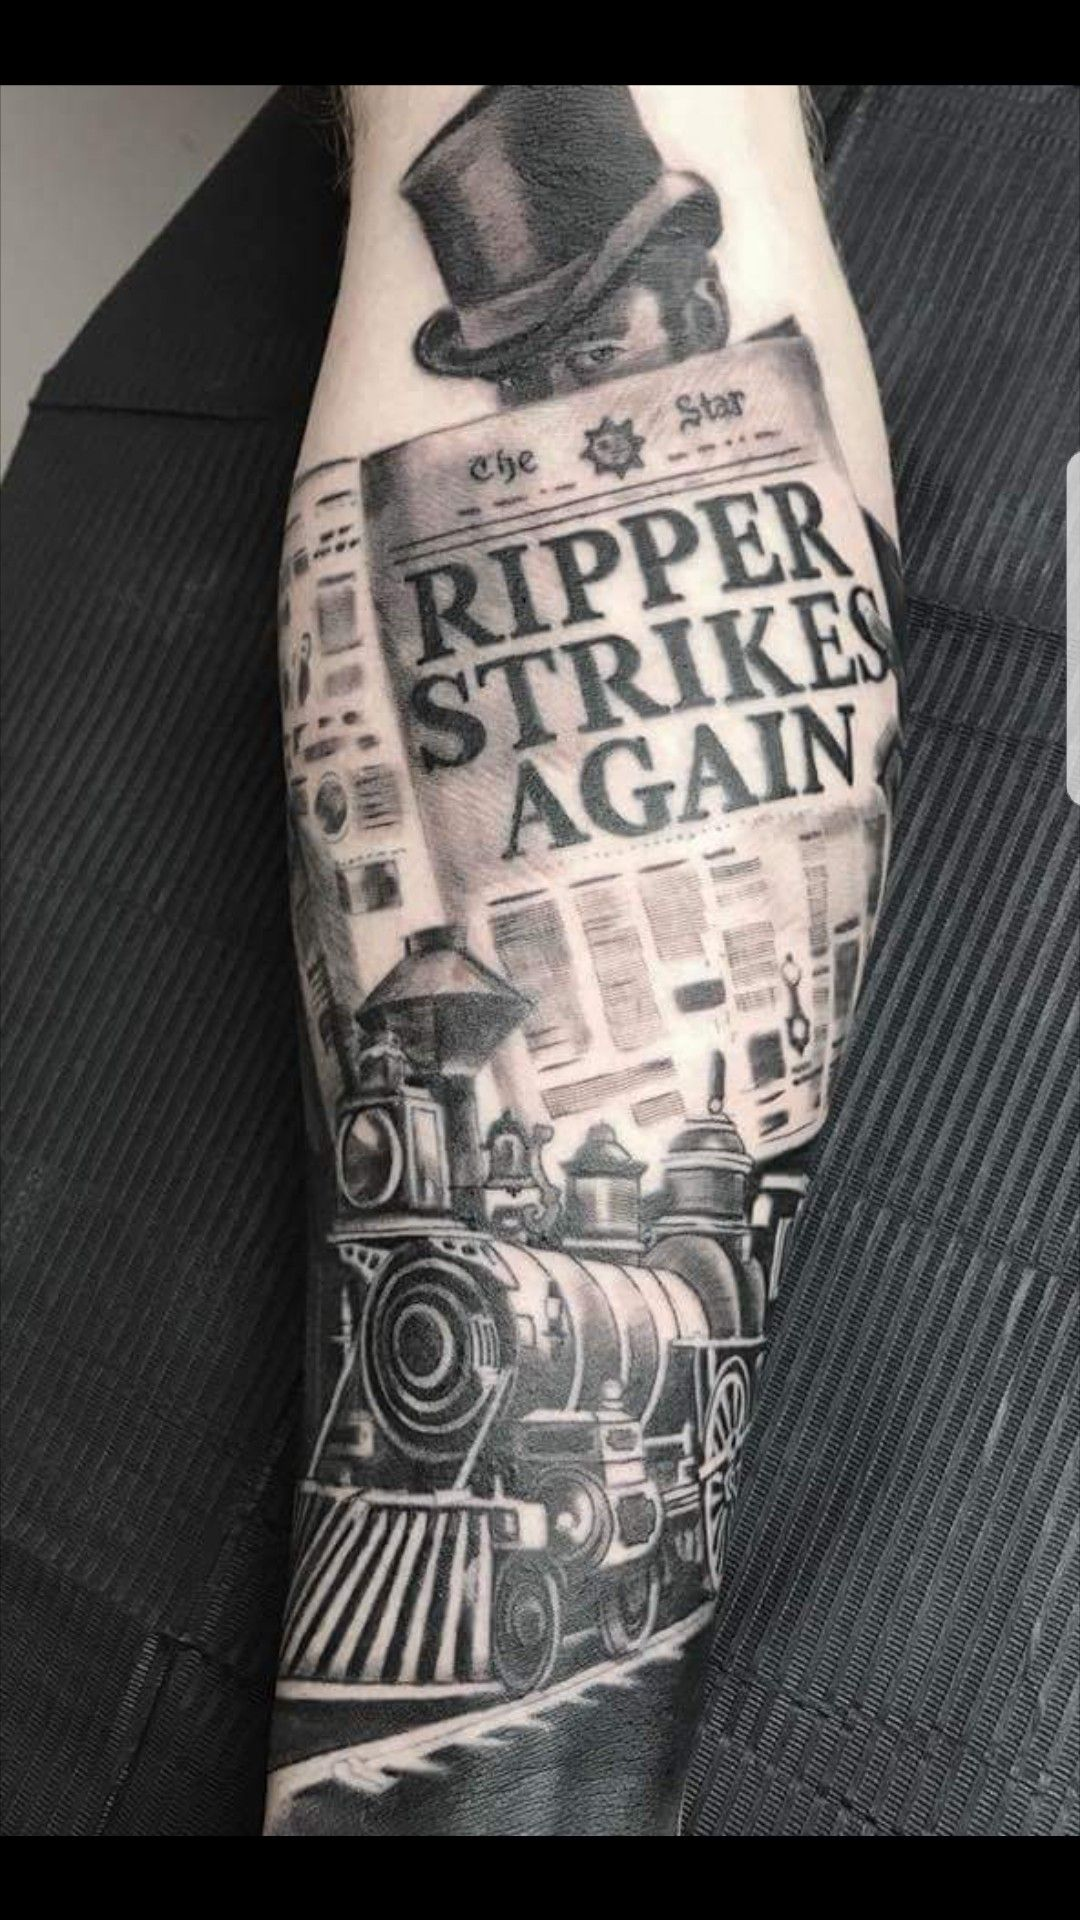 Pin by heather gurley on tattoos pinterest tattoo tatoo and tatting